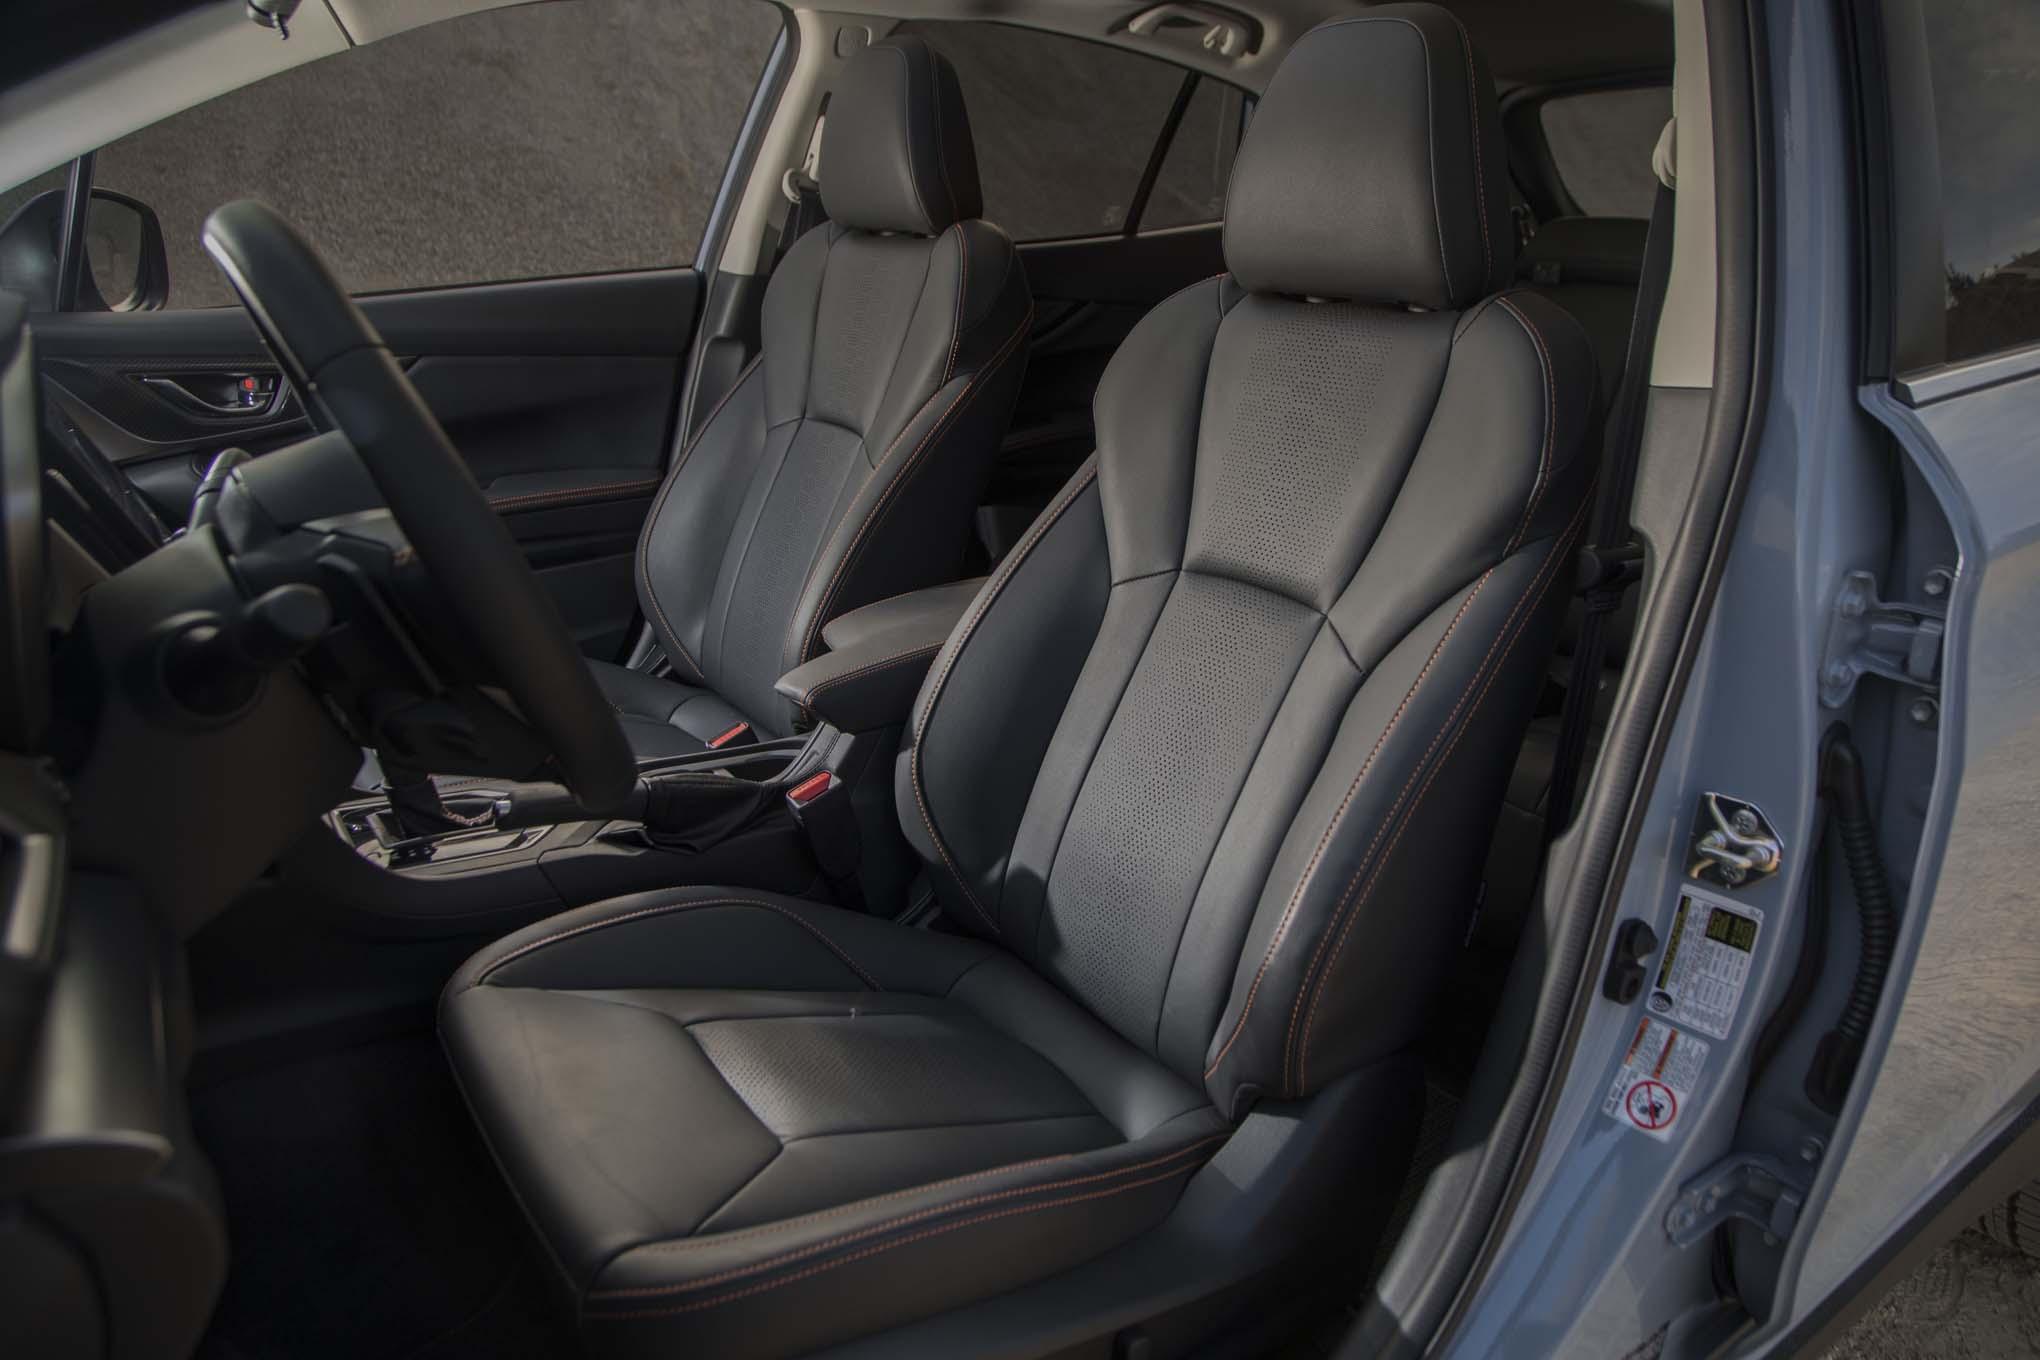 2018 Subaru Crosstrek 2 0i Limited One Week Review Automobile Magazine